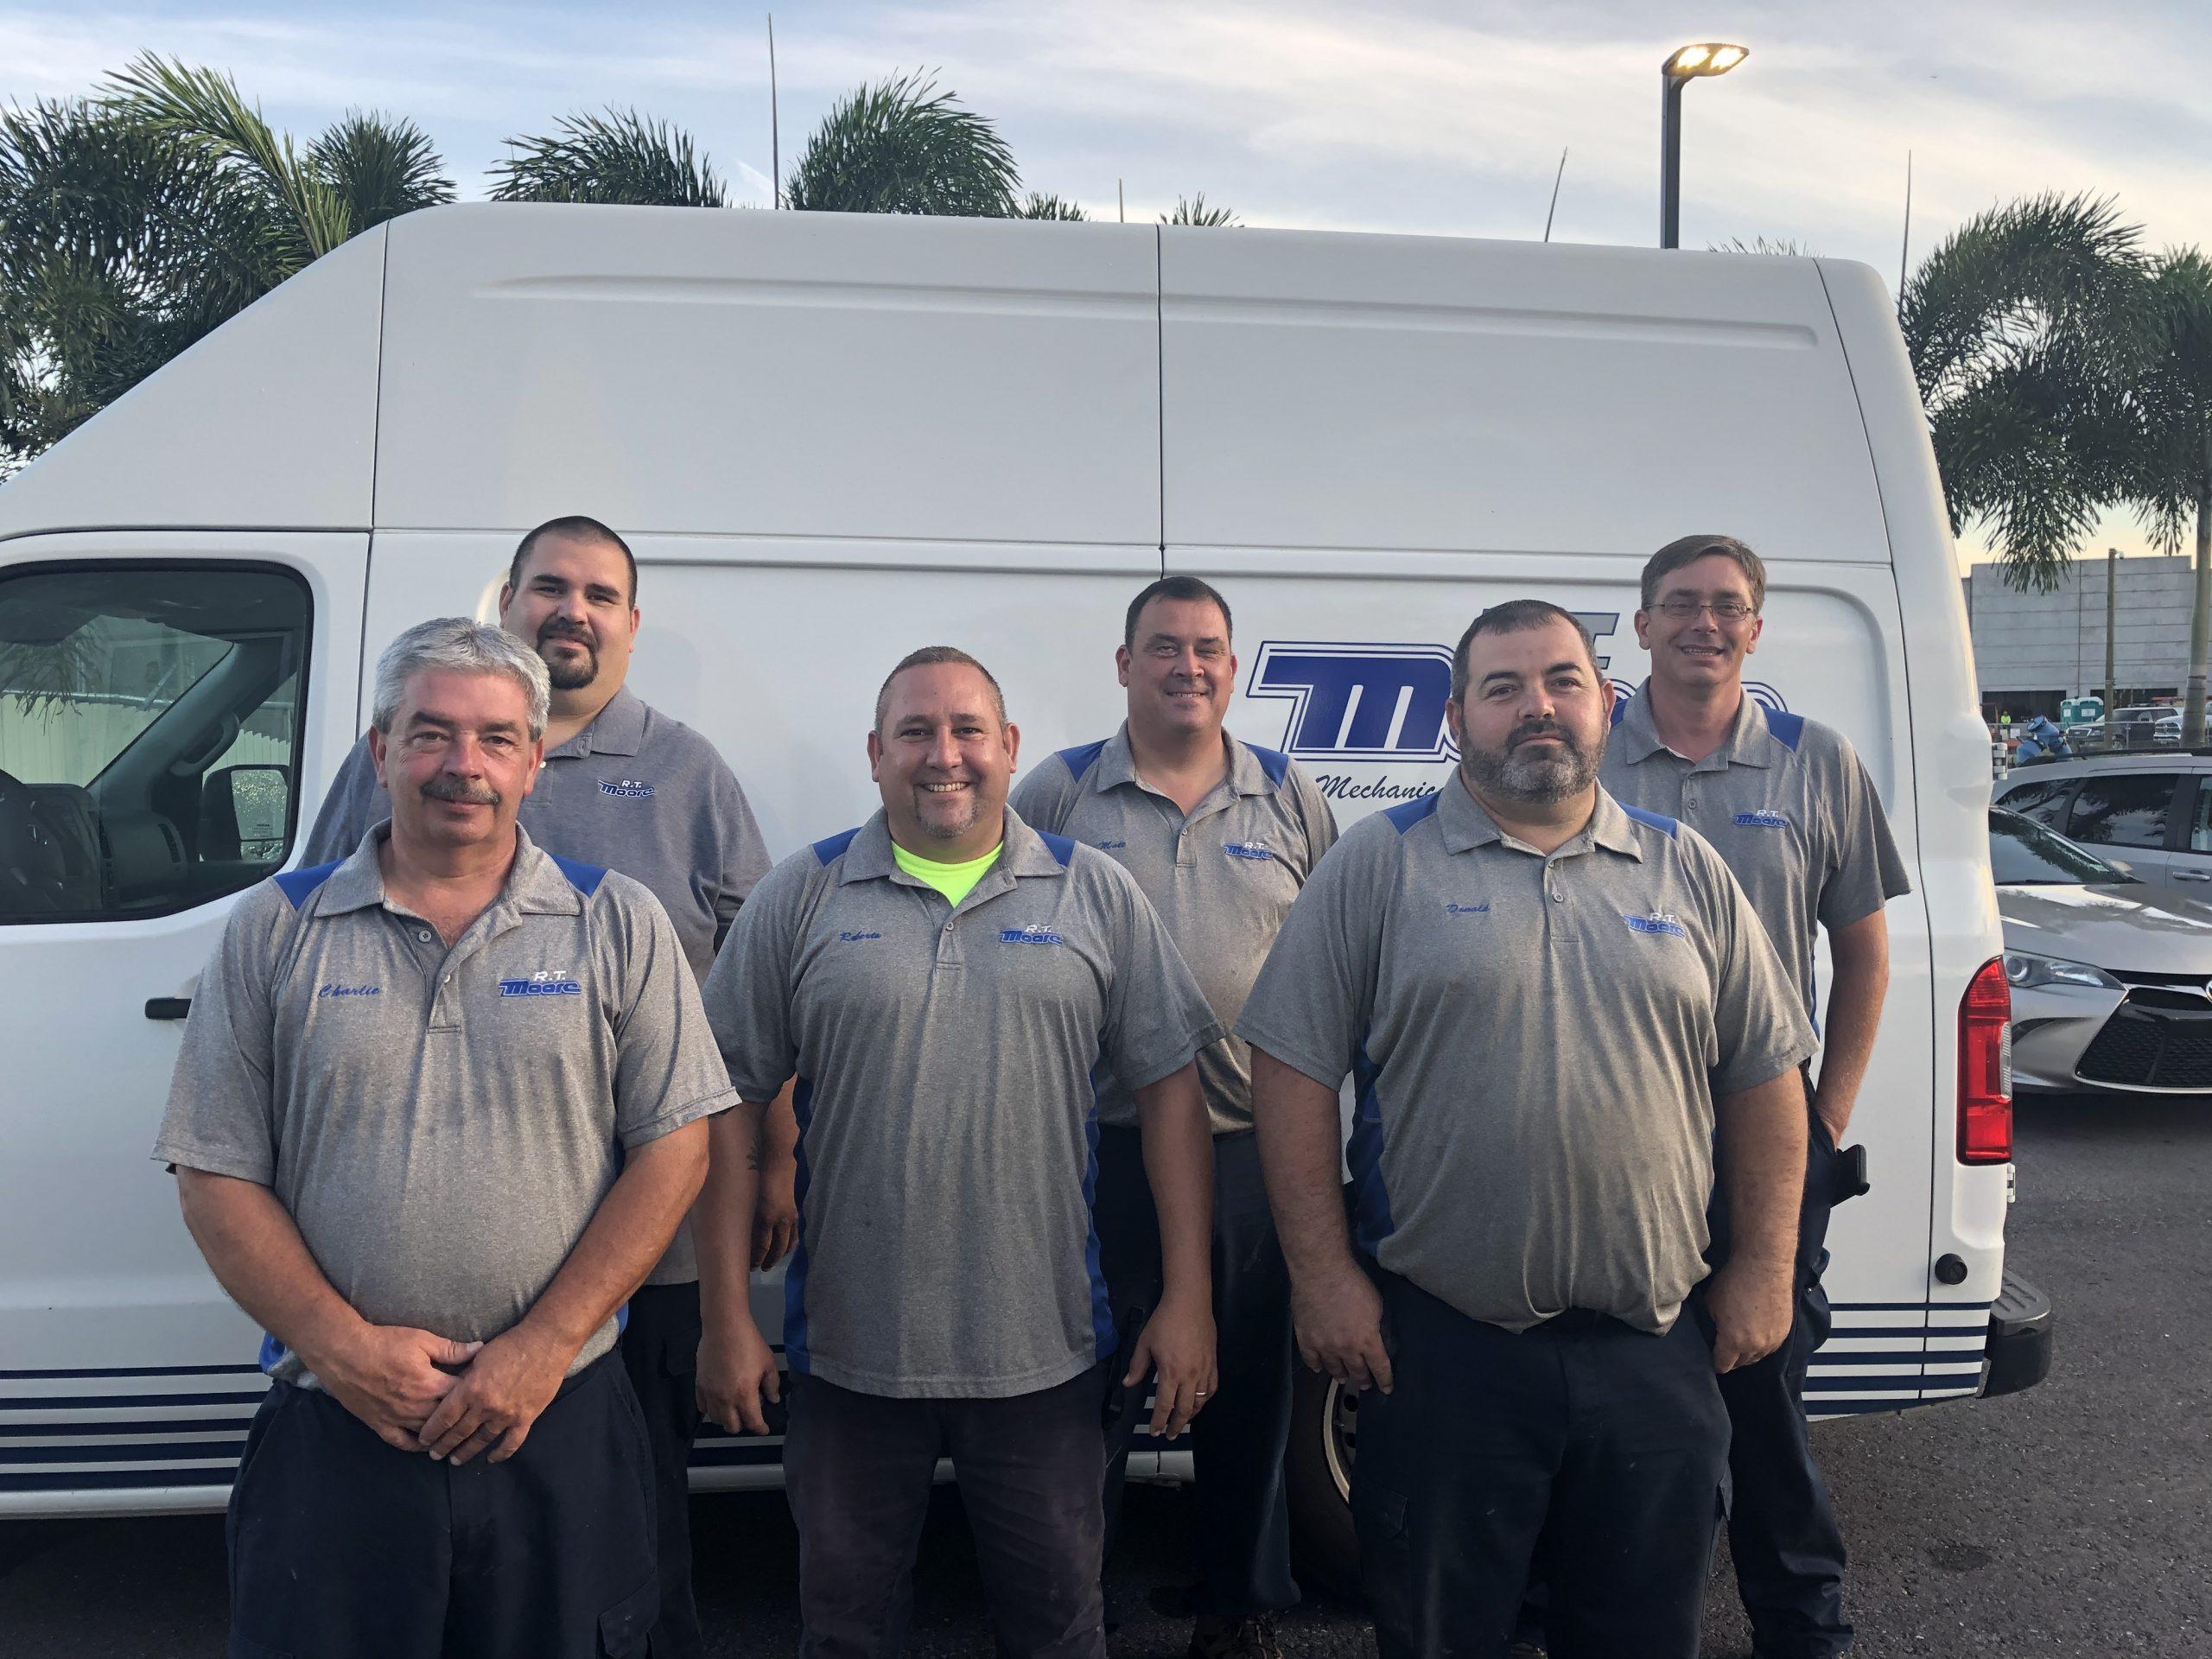 Plumbing service crew